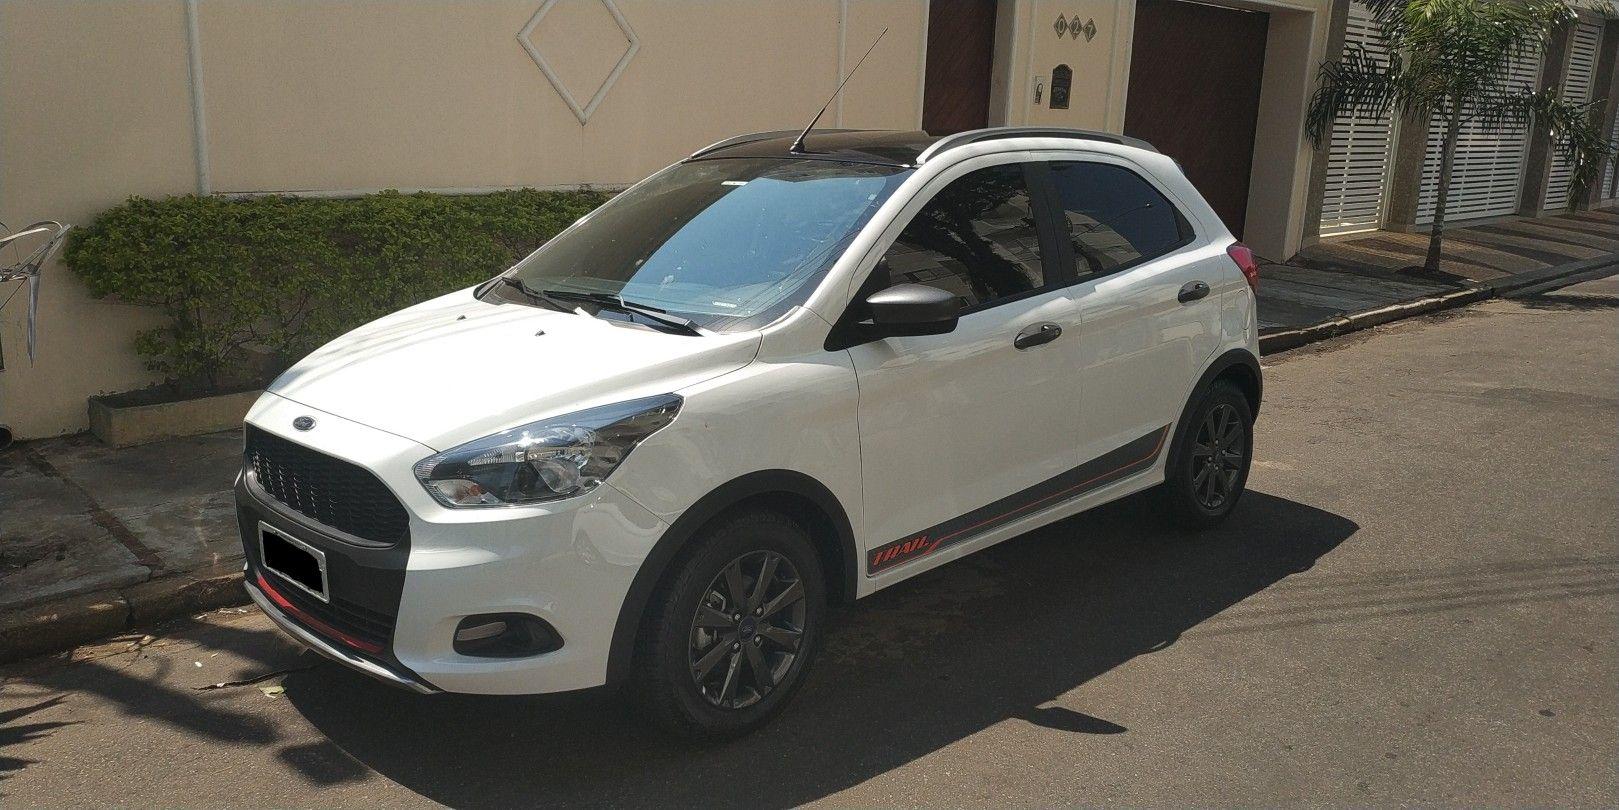 Ford Ka Branco Envelopado Boca Preta Suv Suv Car Car